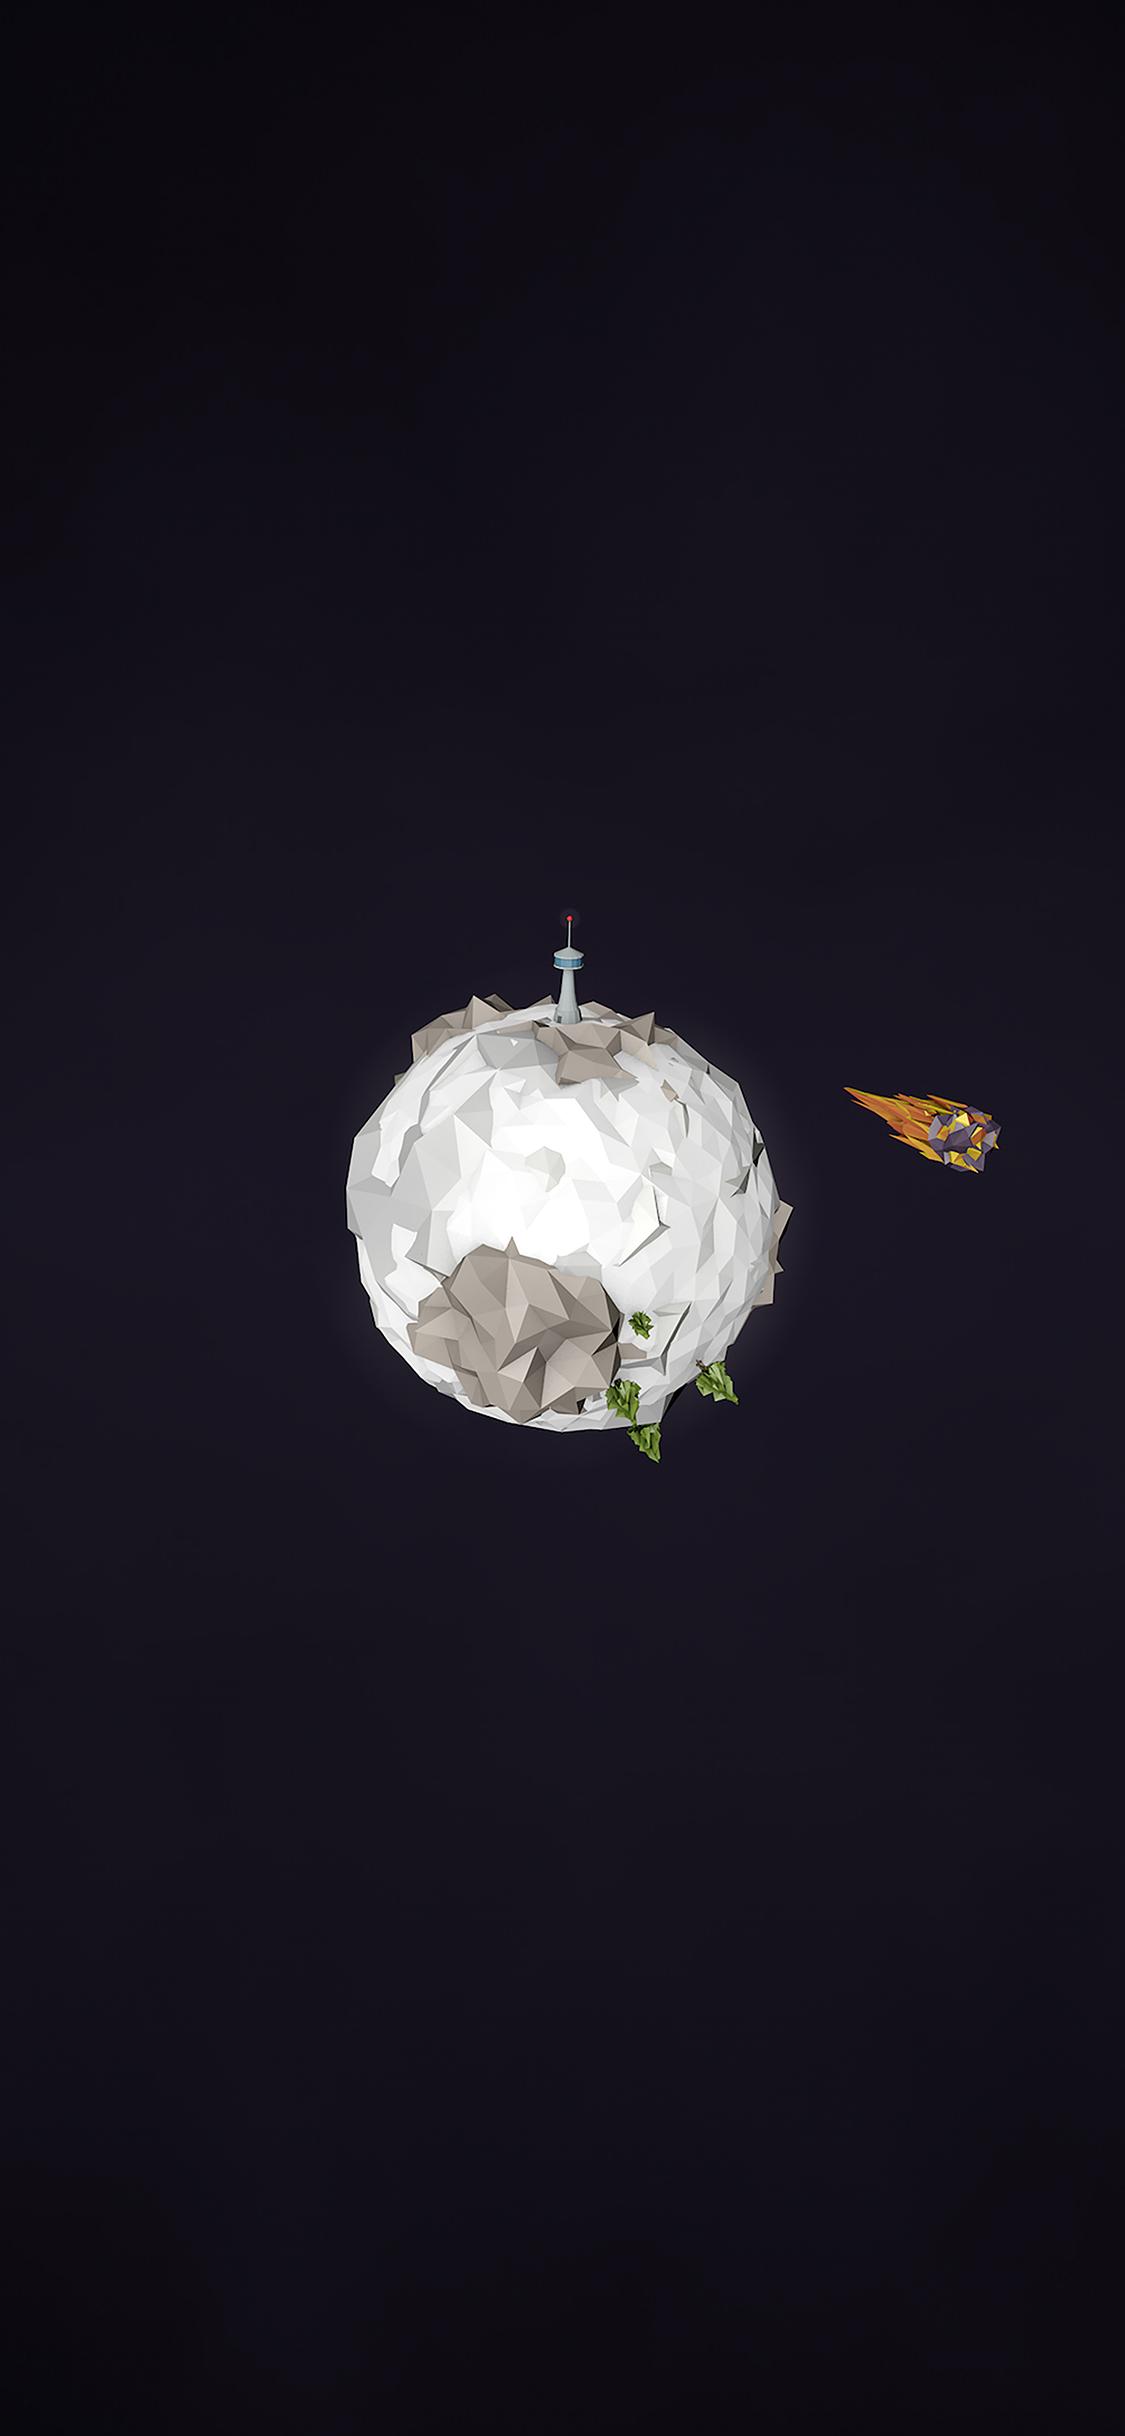 aj32-polygon-planet-cute-minimal-simple-art-dark - Papers.co